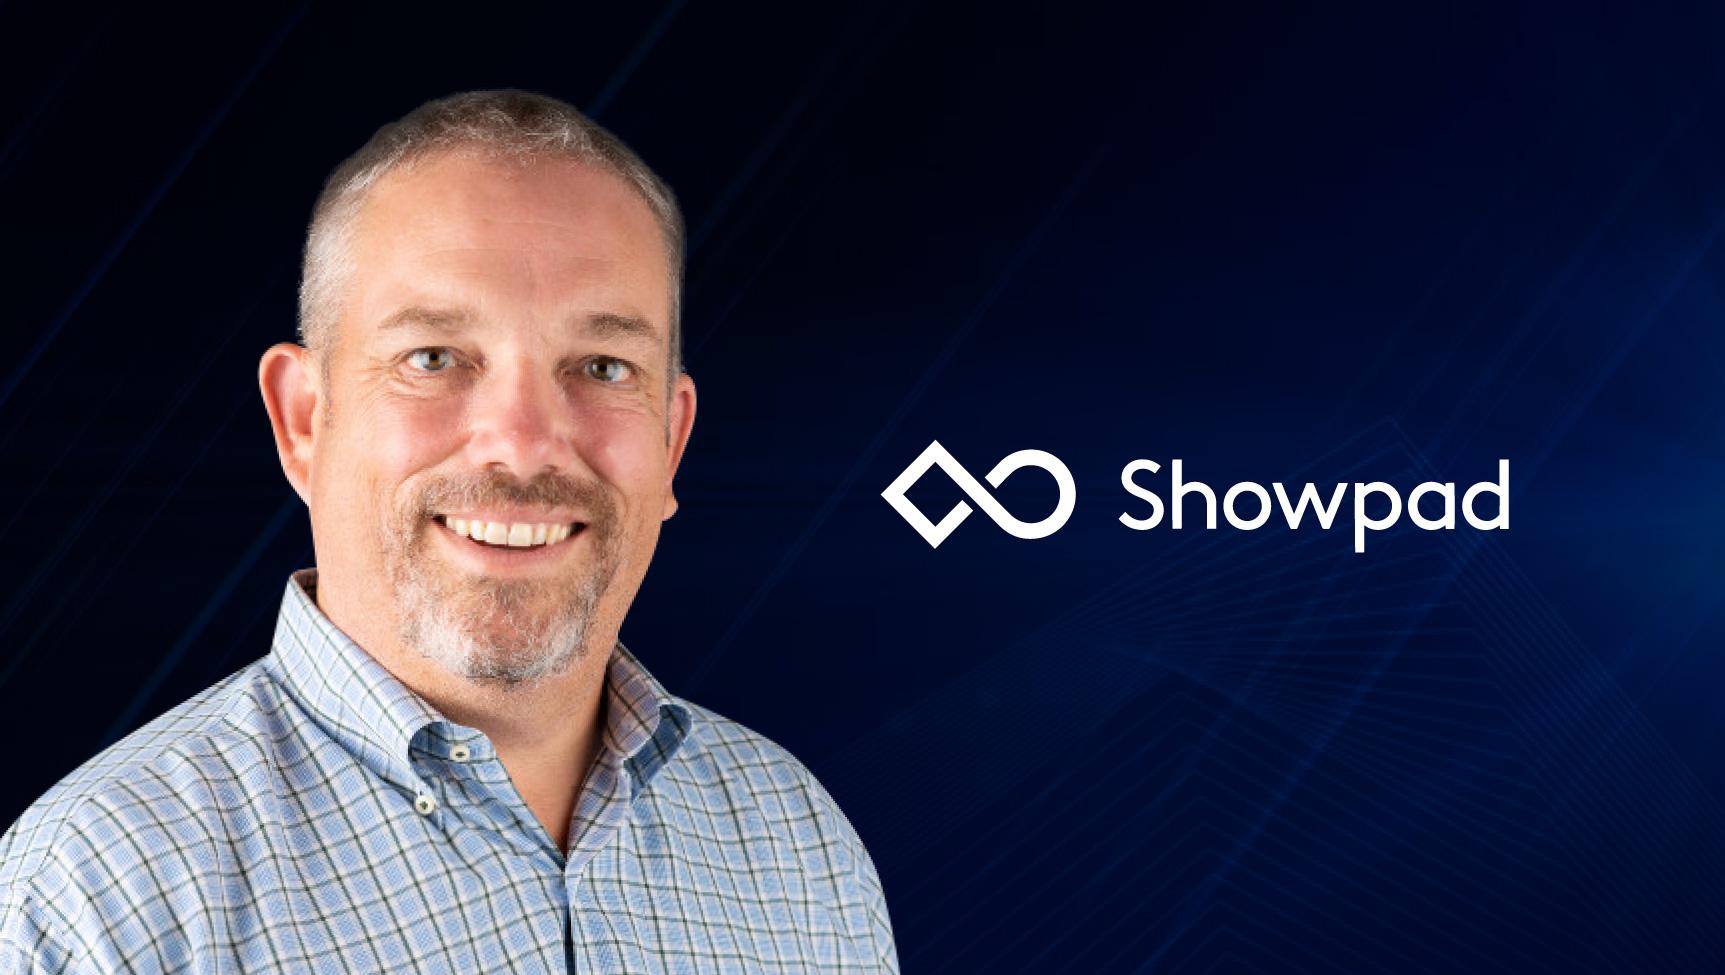 SalesTech Star Interview with Jason Holmes, COO, Showpad